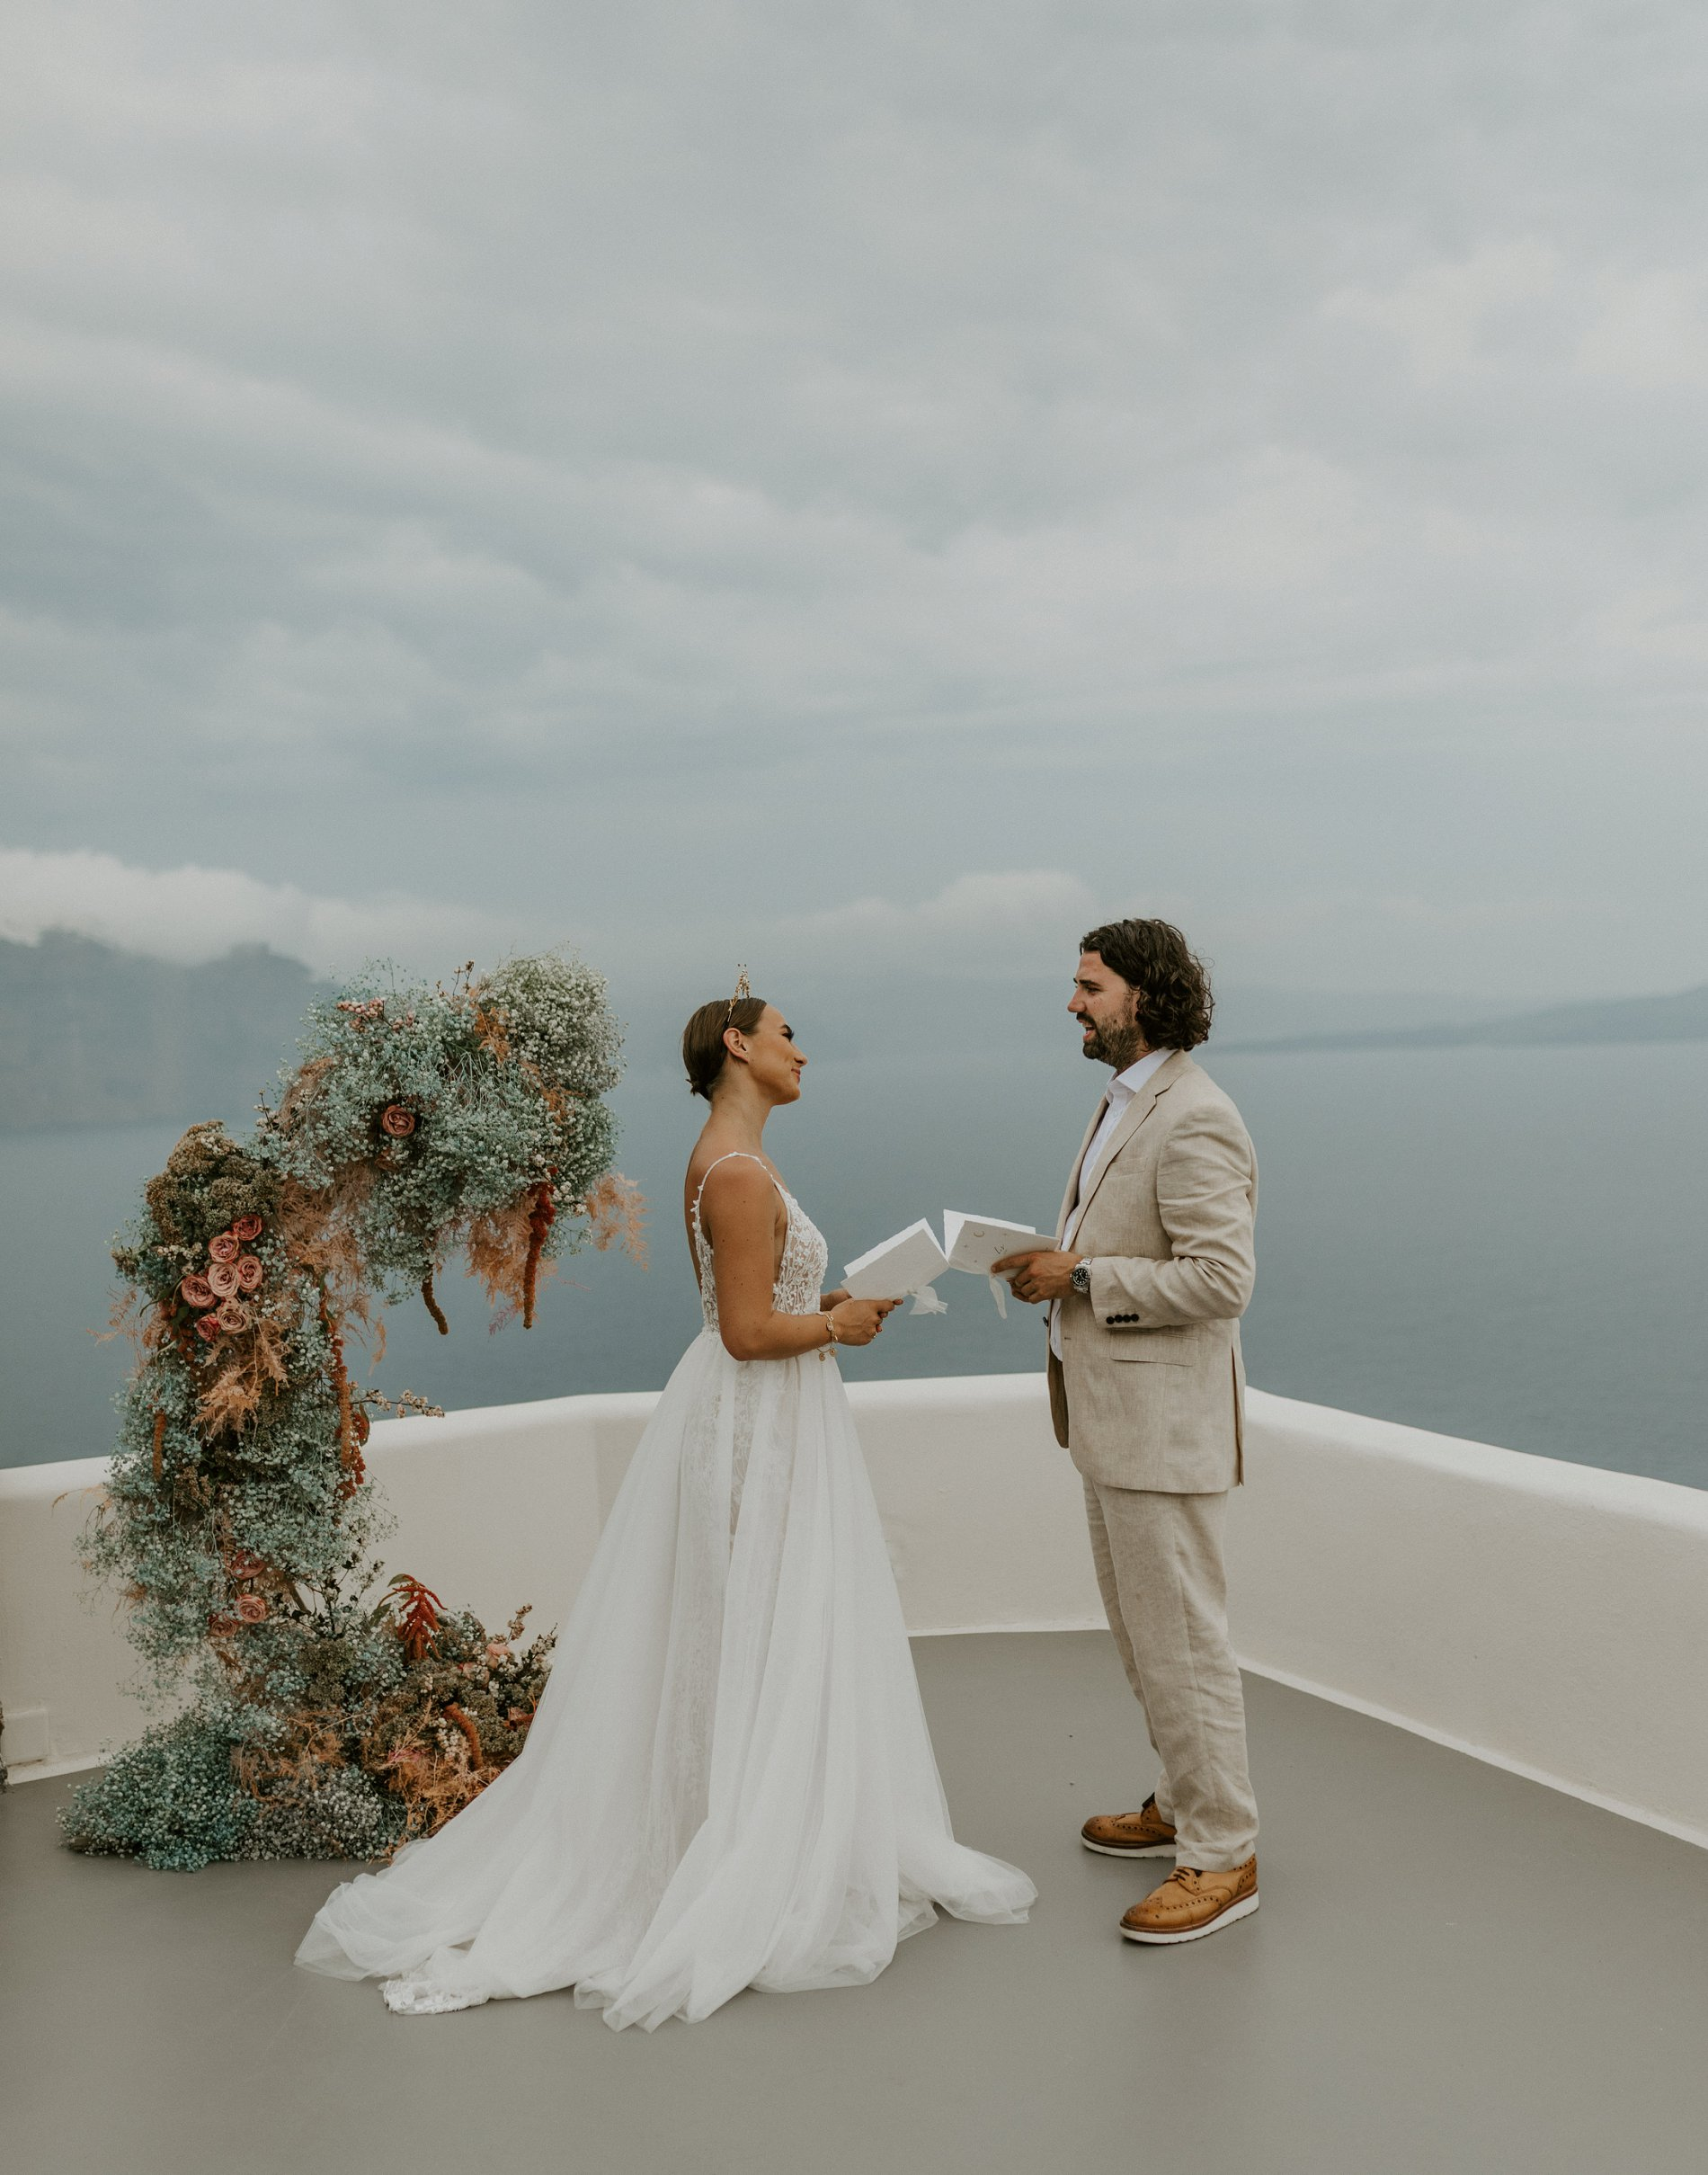 Santorini Elopement 2020